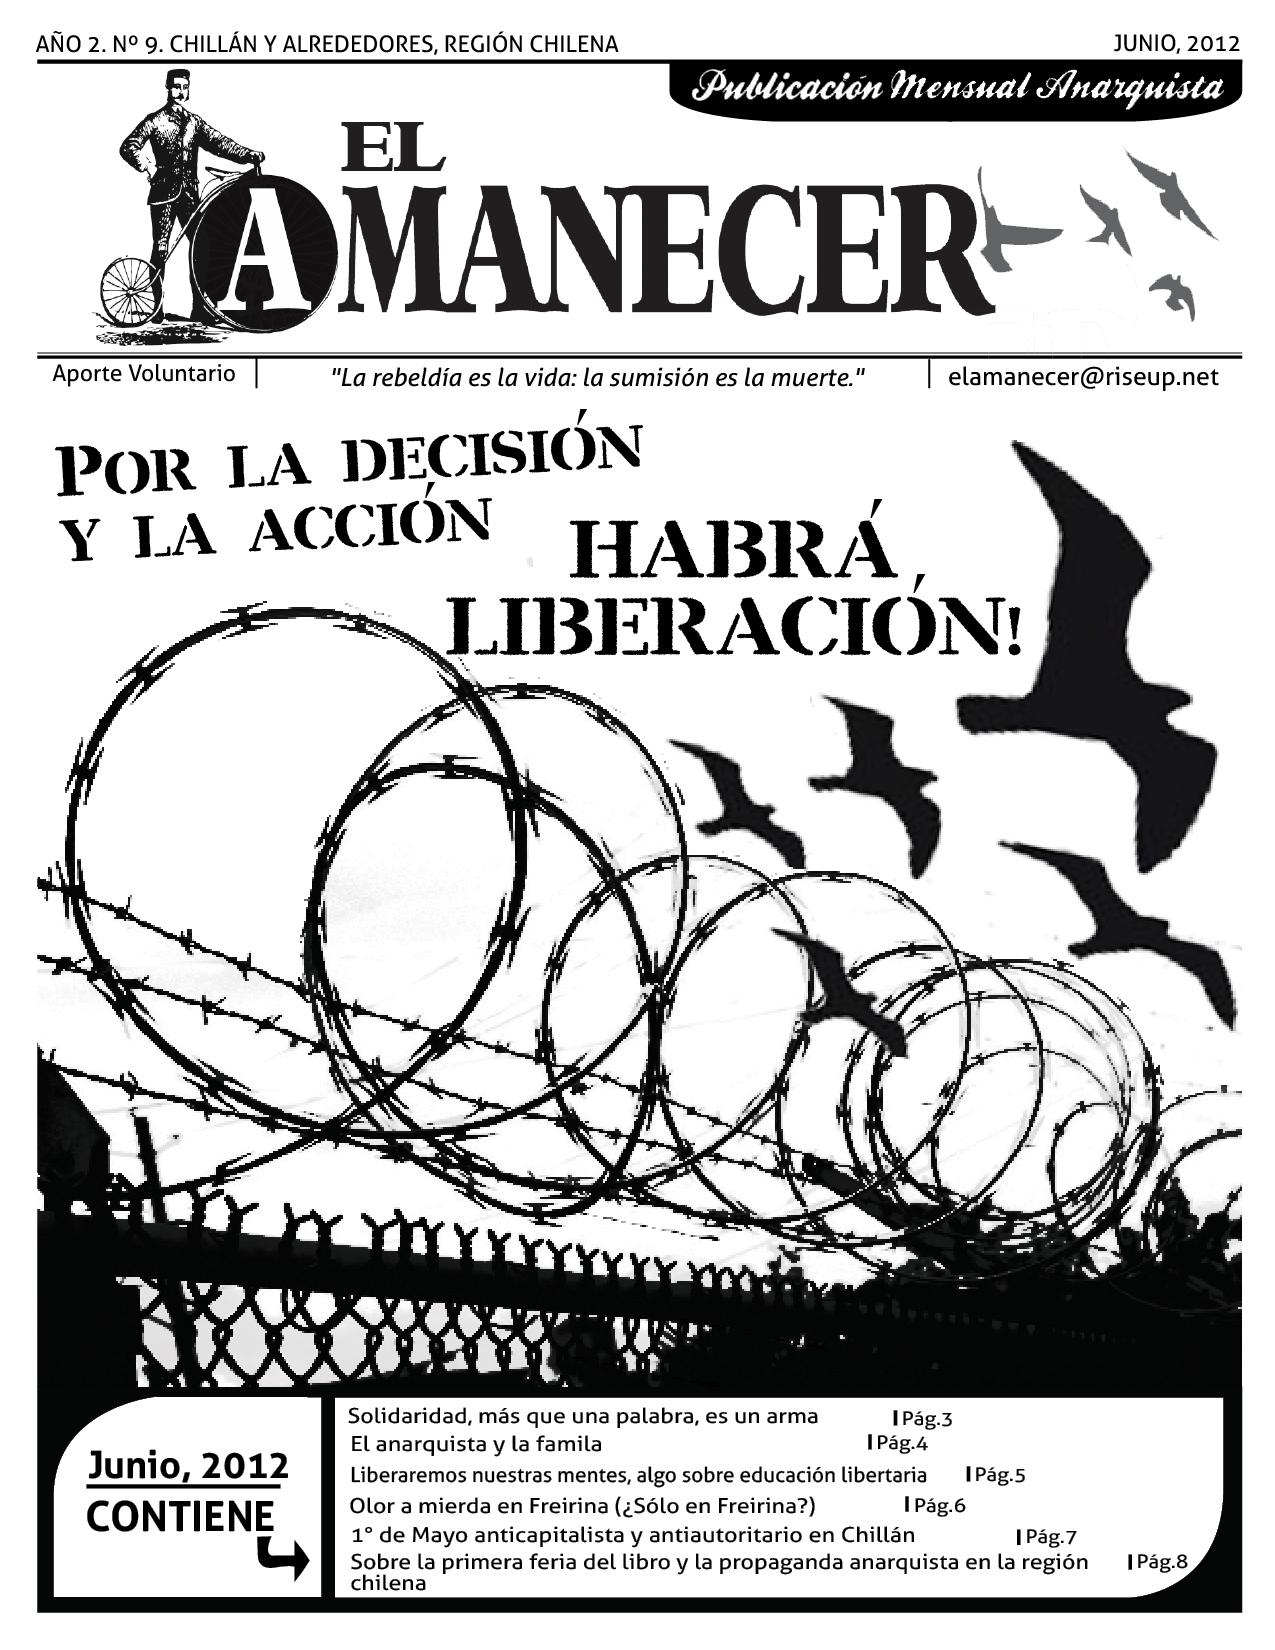 http://periodicoelamanecer.files.wordpress.com/2012/05/periodico-anarquista-el-amanecer-junio-2012.jpg